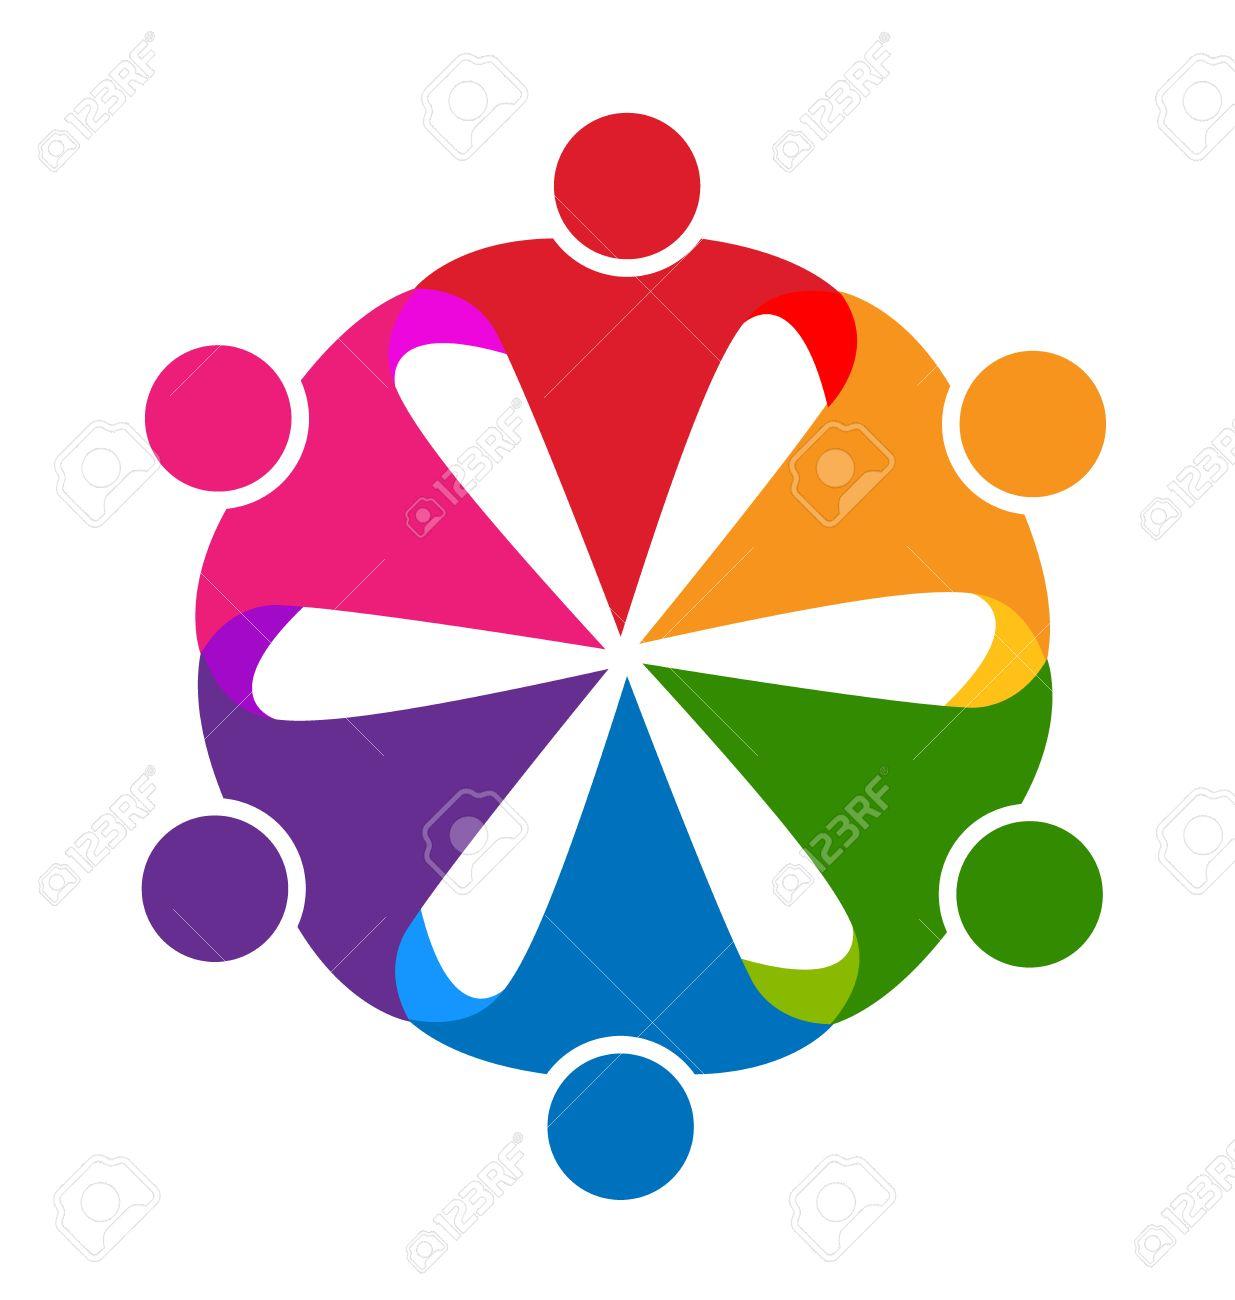 Logo hug people teamwork vector id business card design royalty free banco de imagens logo hug people teamwork vector id business card design reheart Image collections